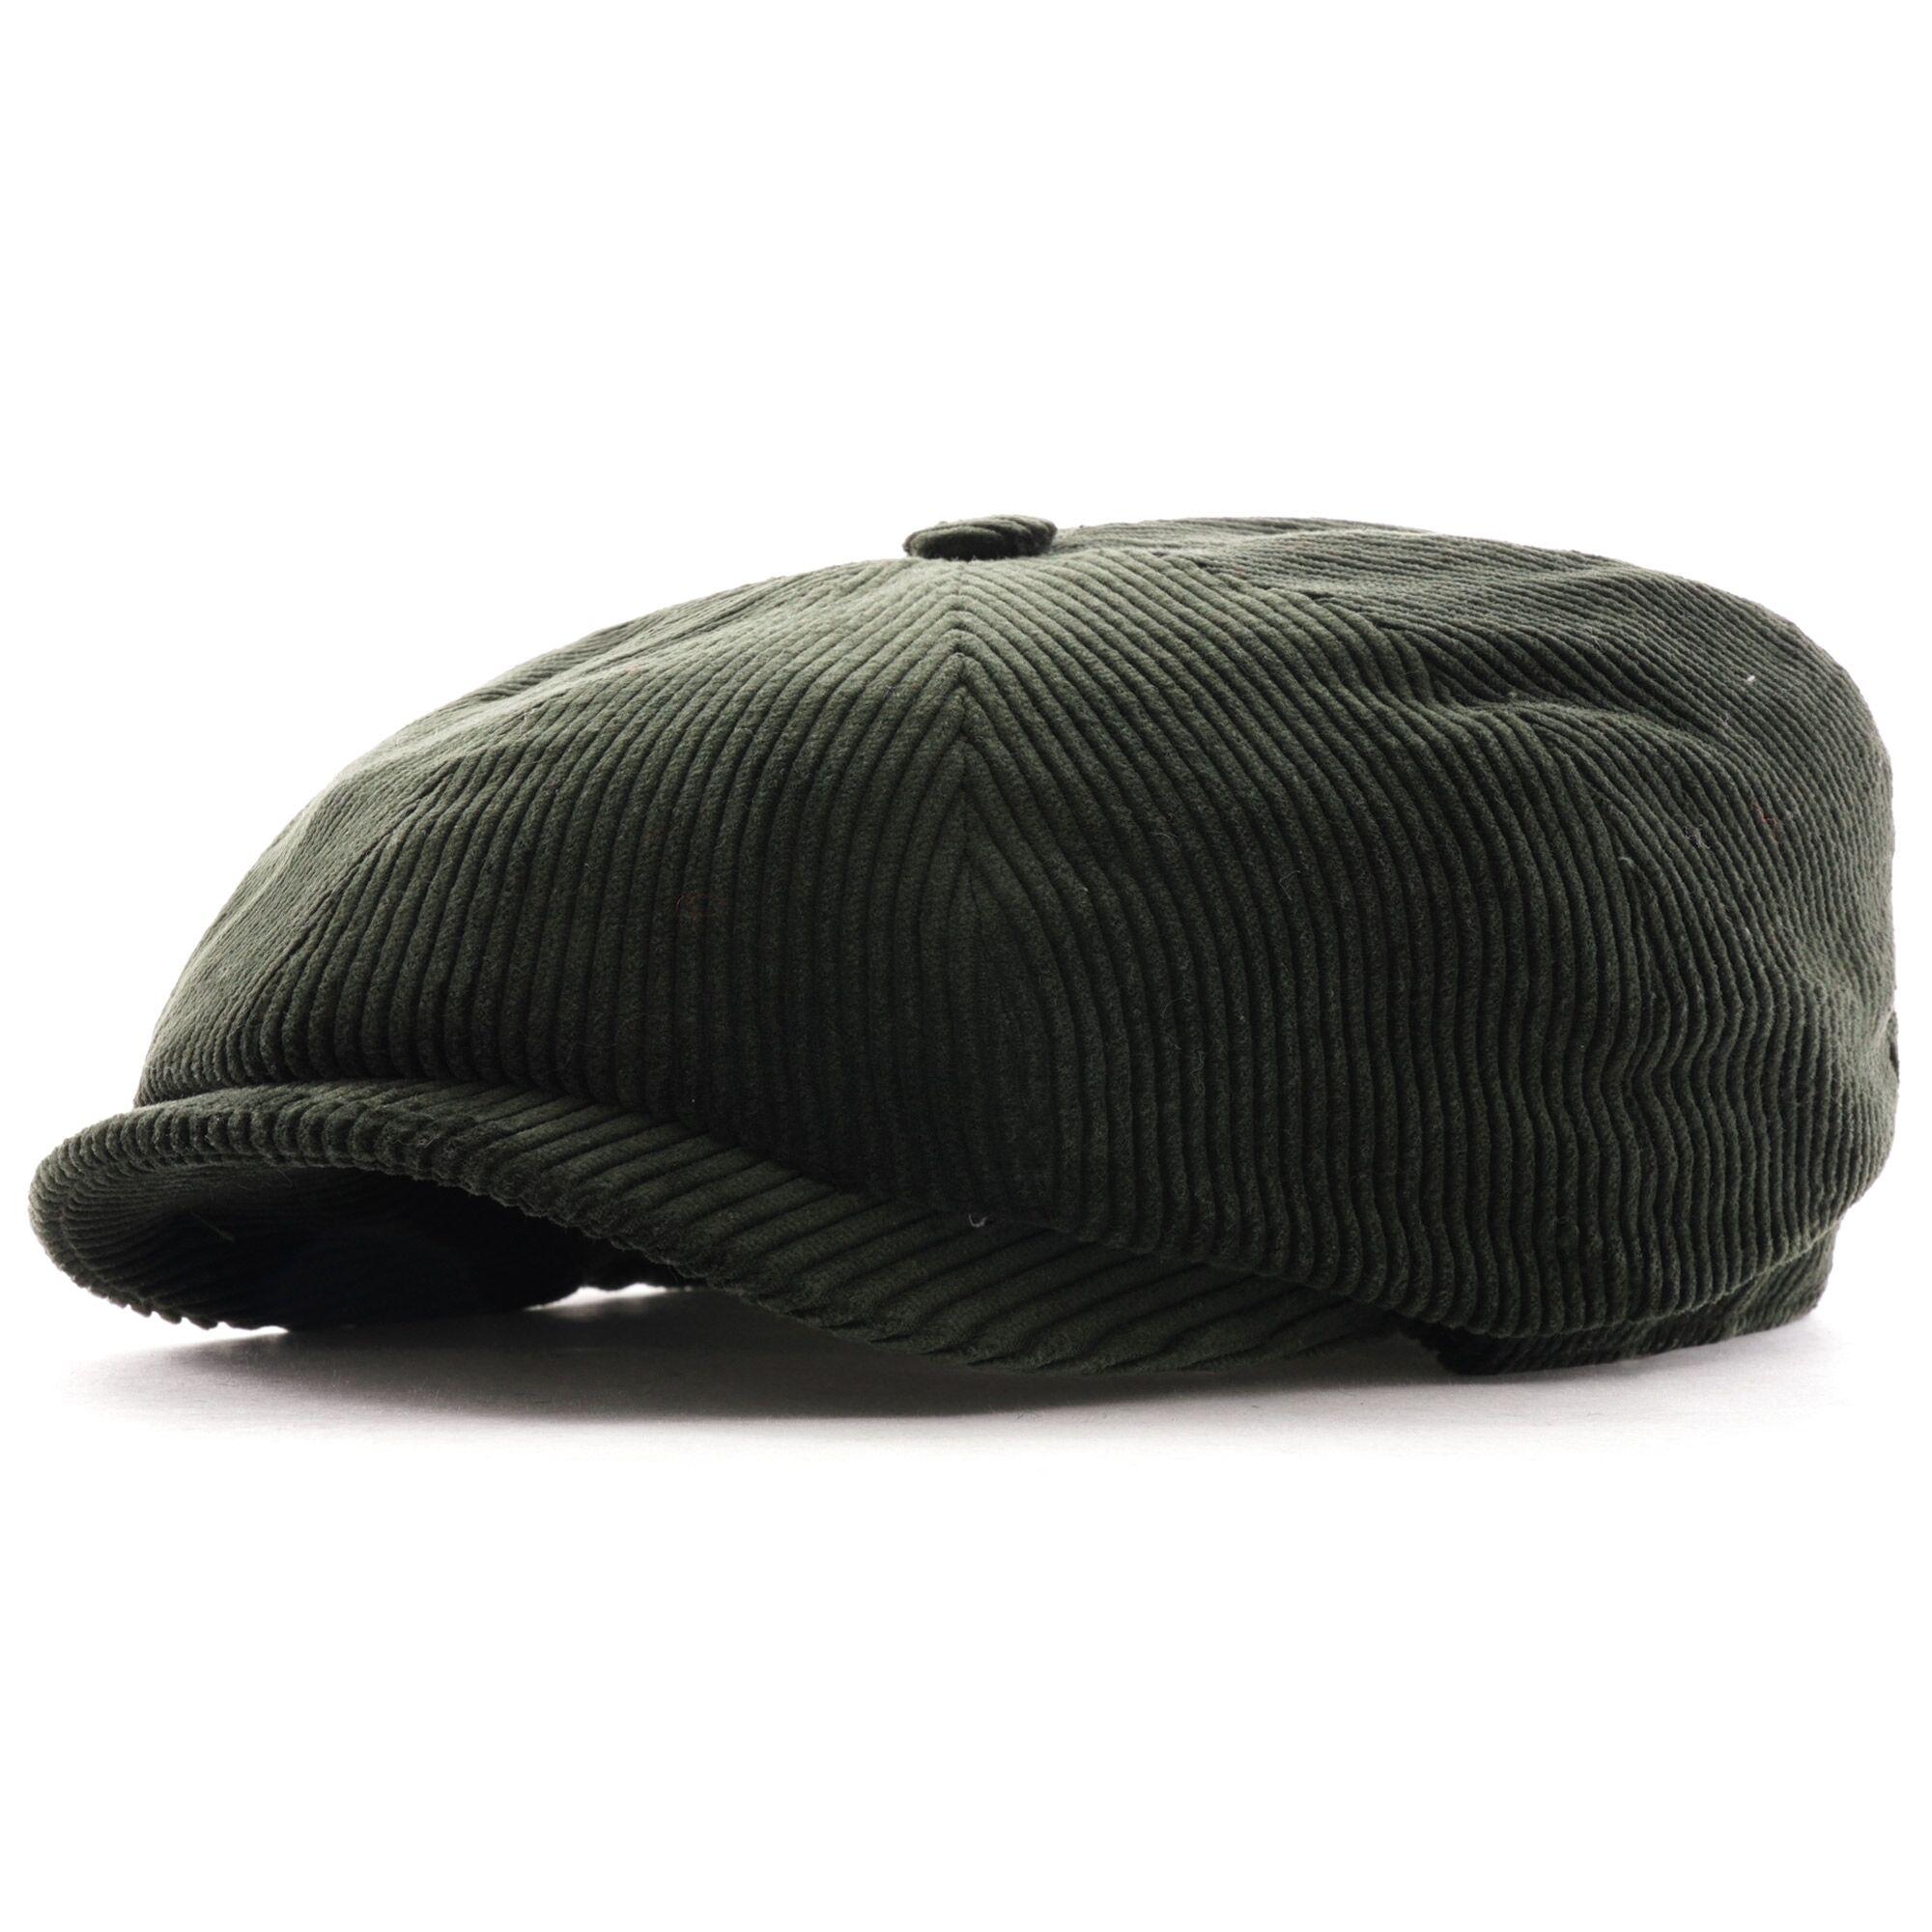 Stetson Hats Hatteras Classic Corduroy Flat Cap   Green   6841107-4 GRN